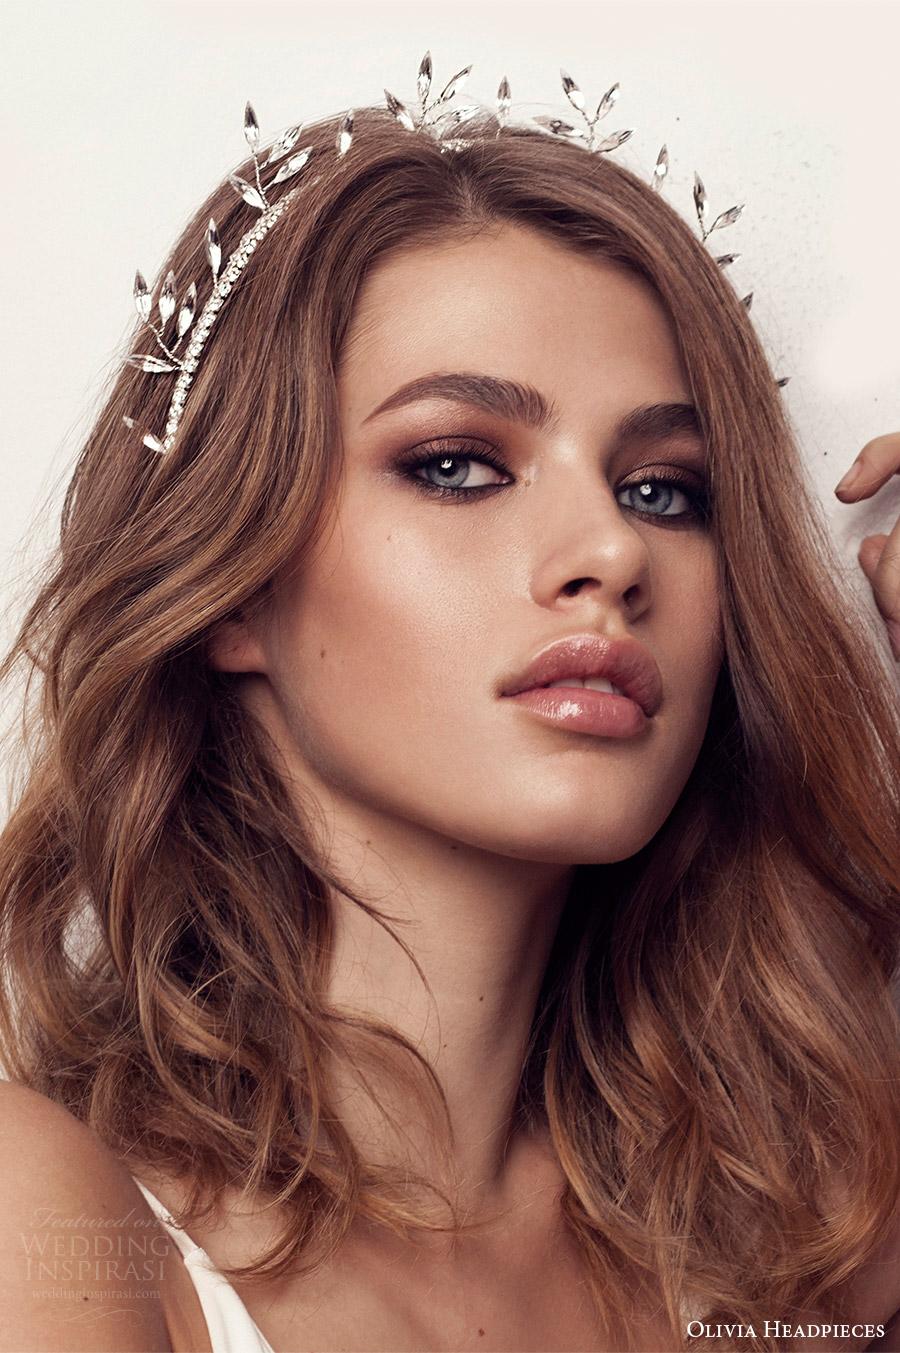 olivia headpieces 2017 bridal hair accessories walk on the wide side crystal headband wedding